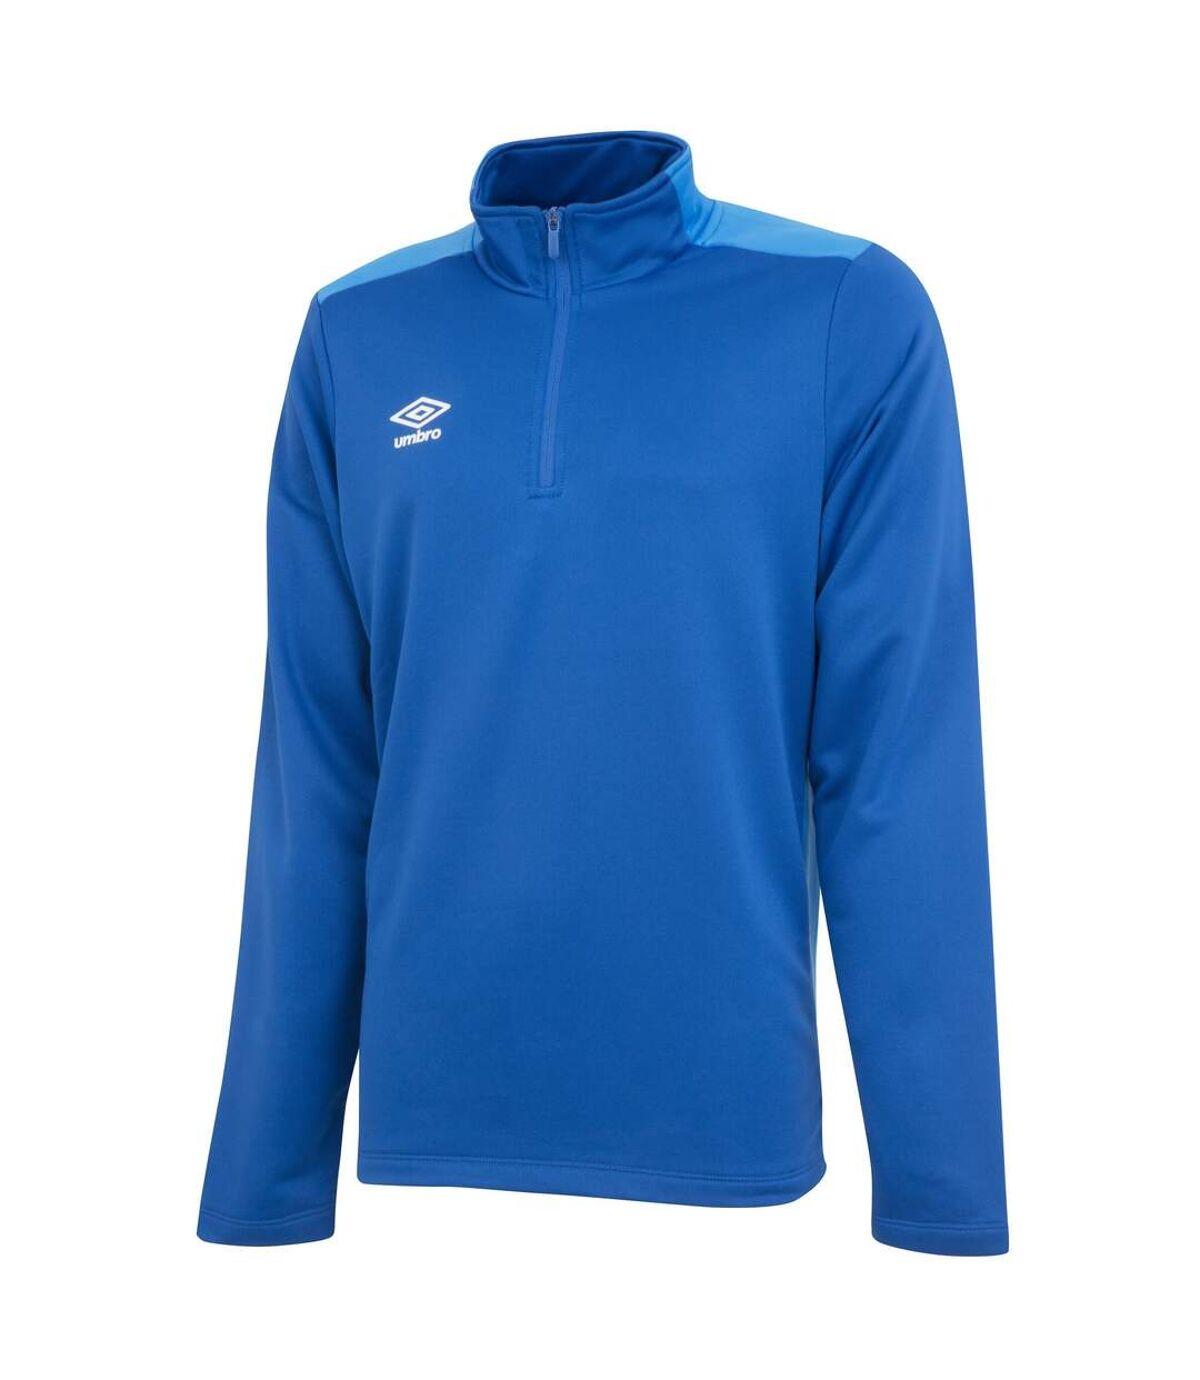 Umbro Mens Half Zip Sweatshirt (Royal Blue/French Blue) - UTGD107